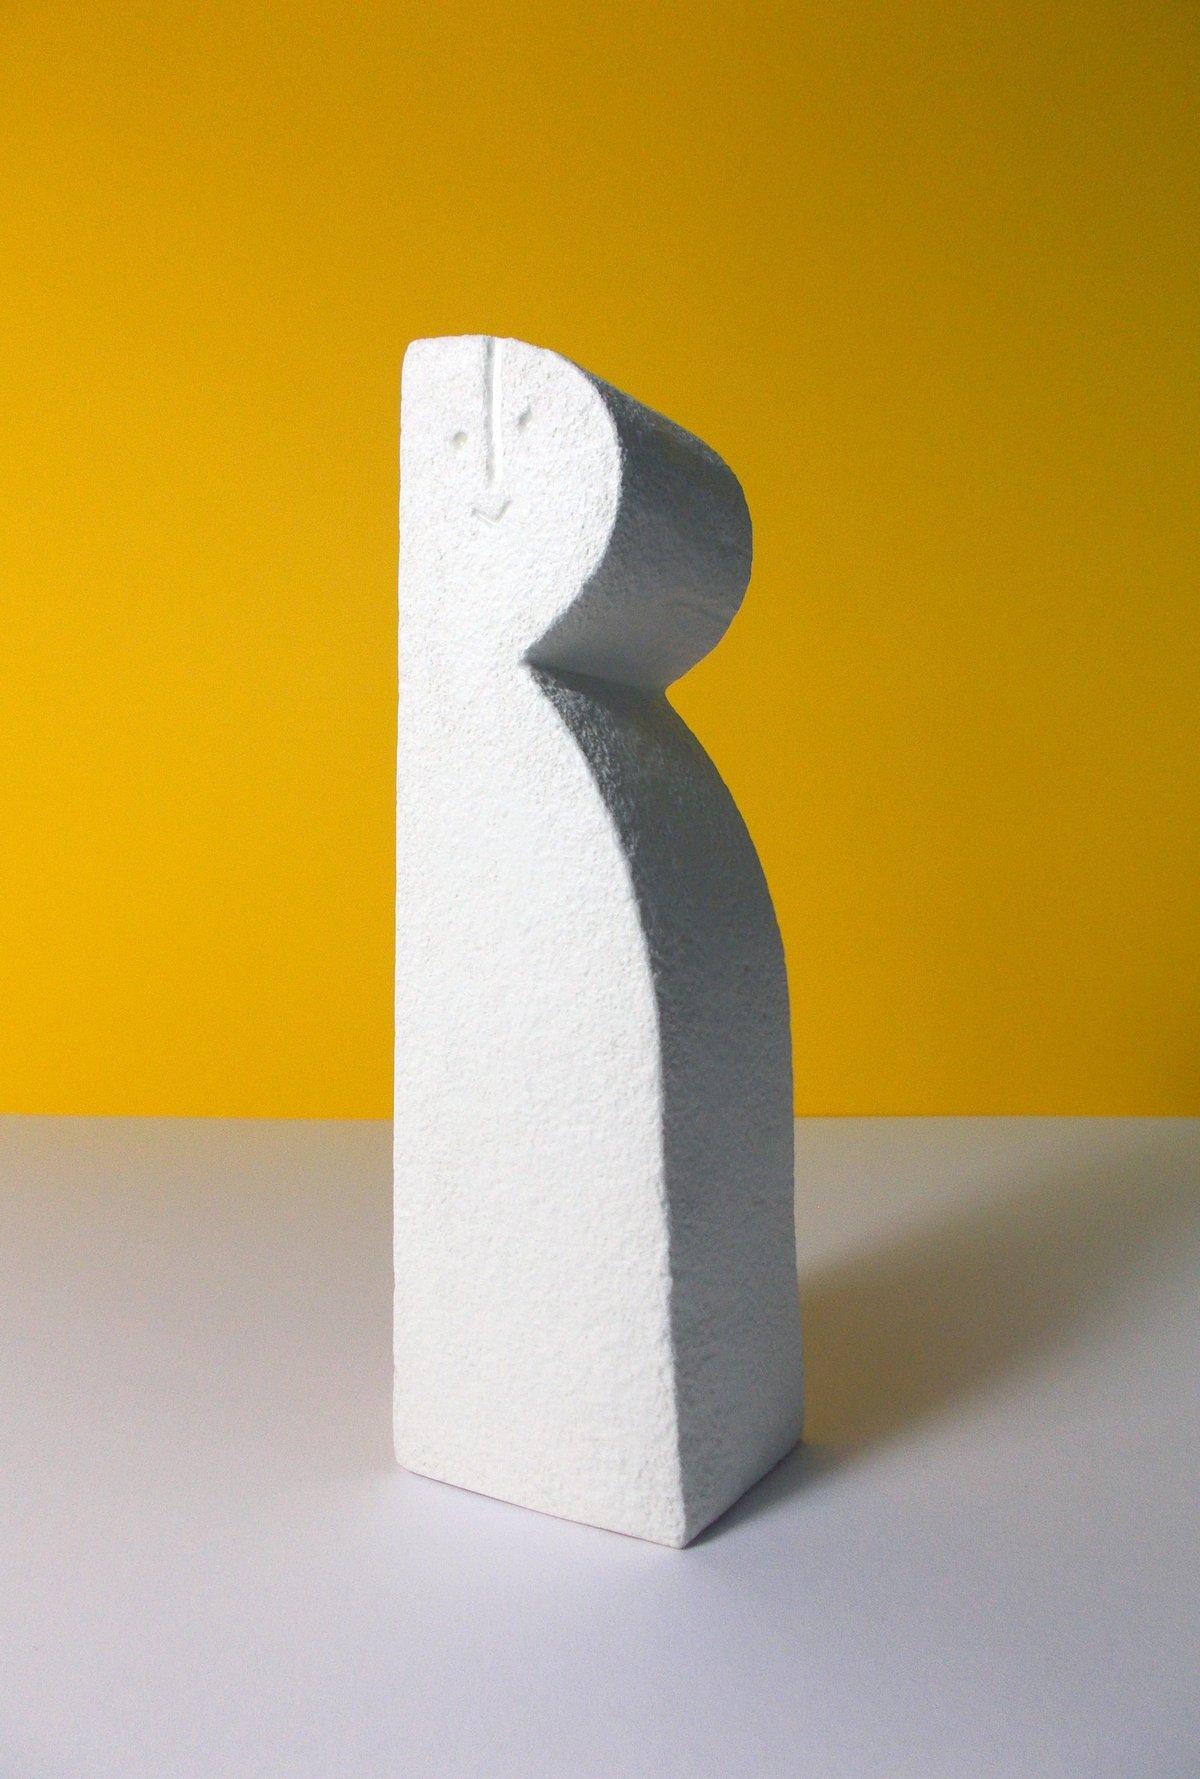 Image of Medium Head - Tall & Thin - MH02